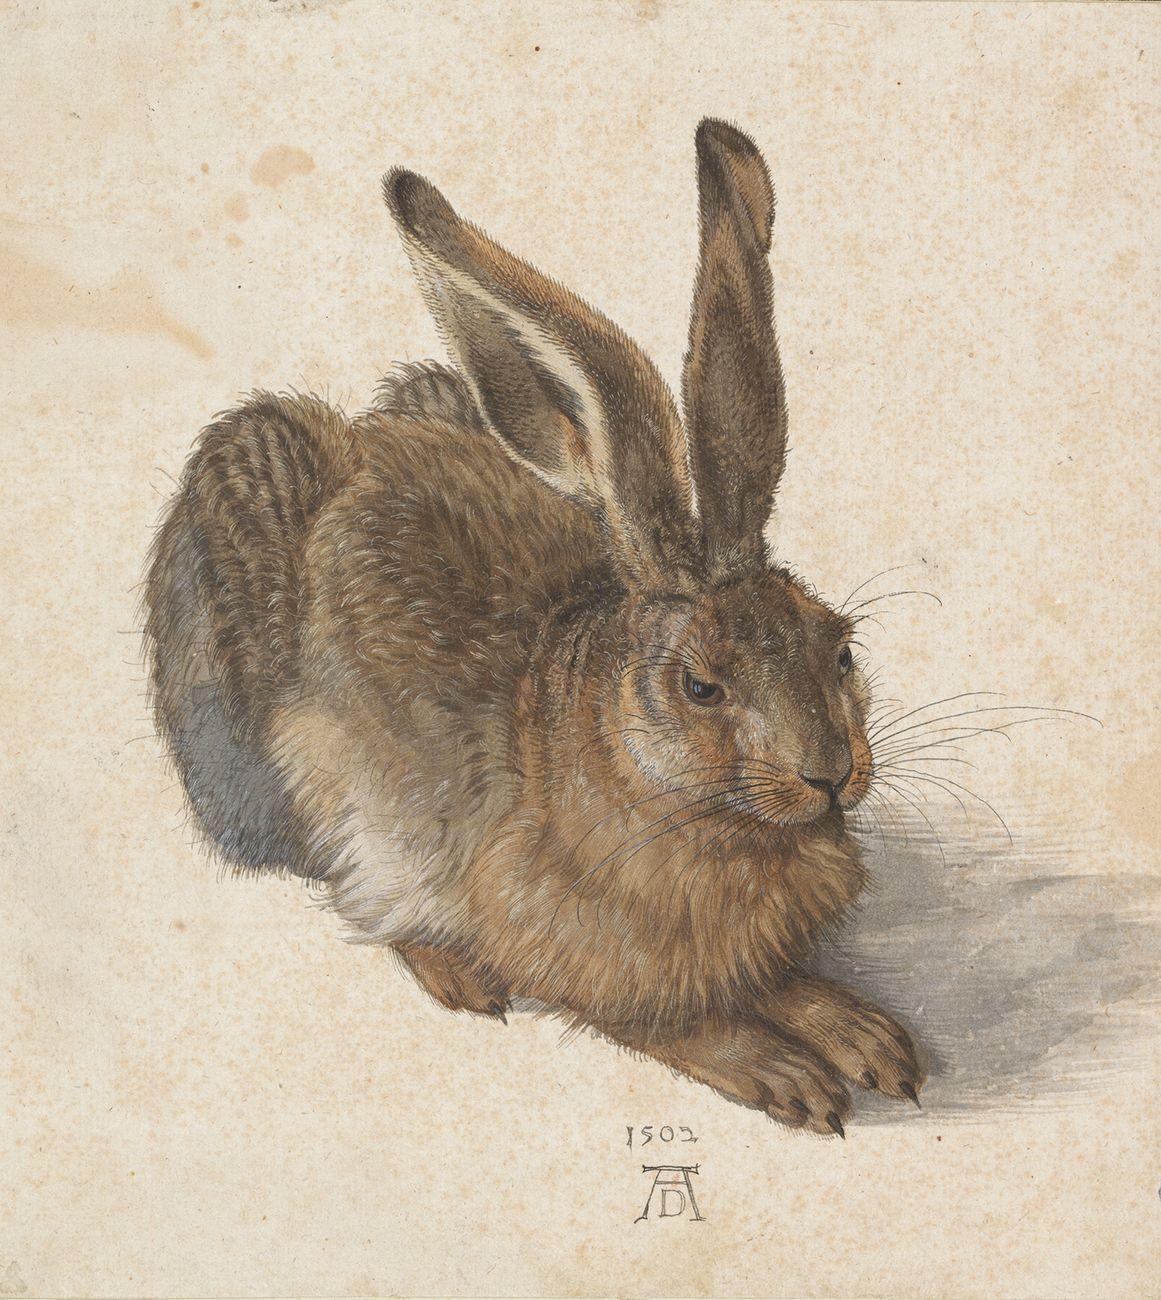 Albrecht Dürer, Feldhase, 1502 © Albertina, Wien